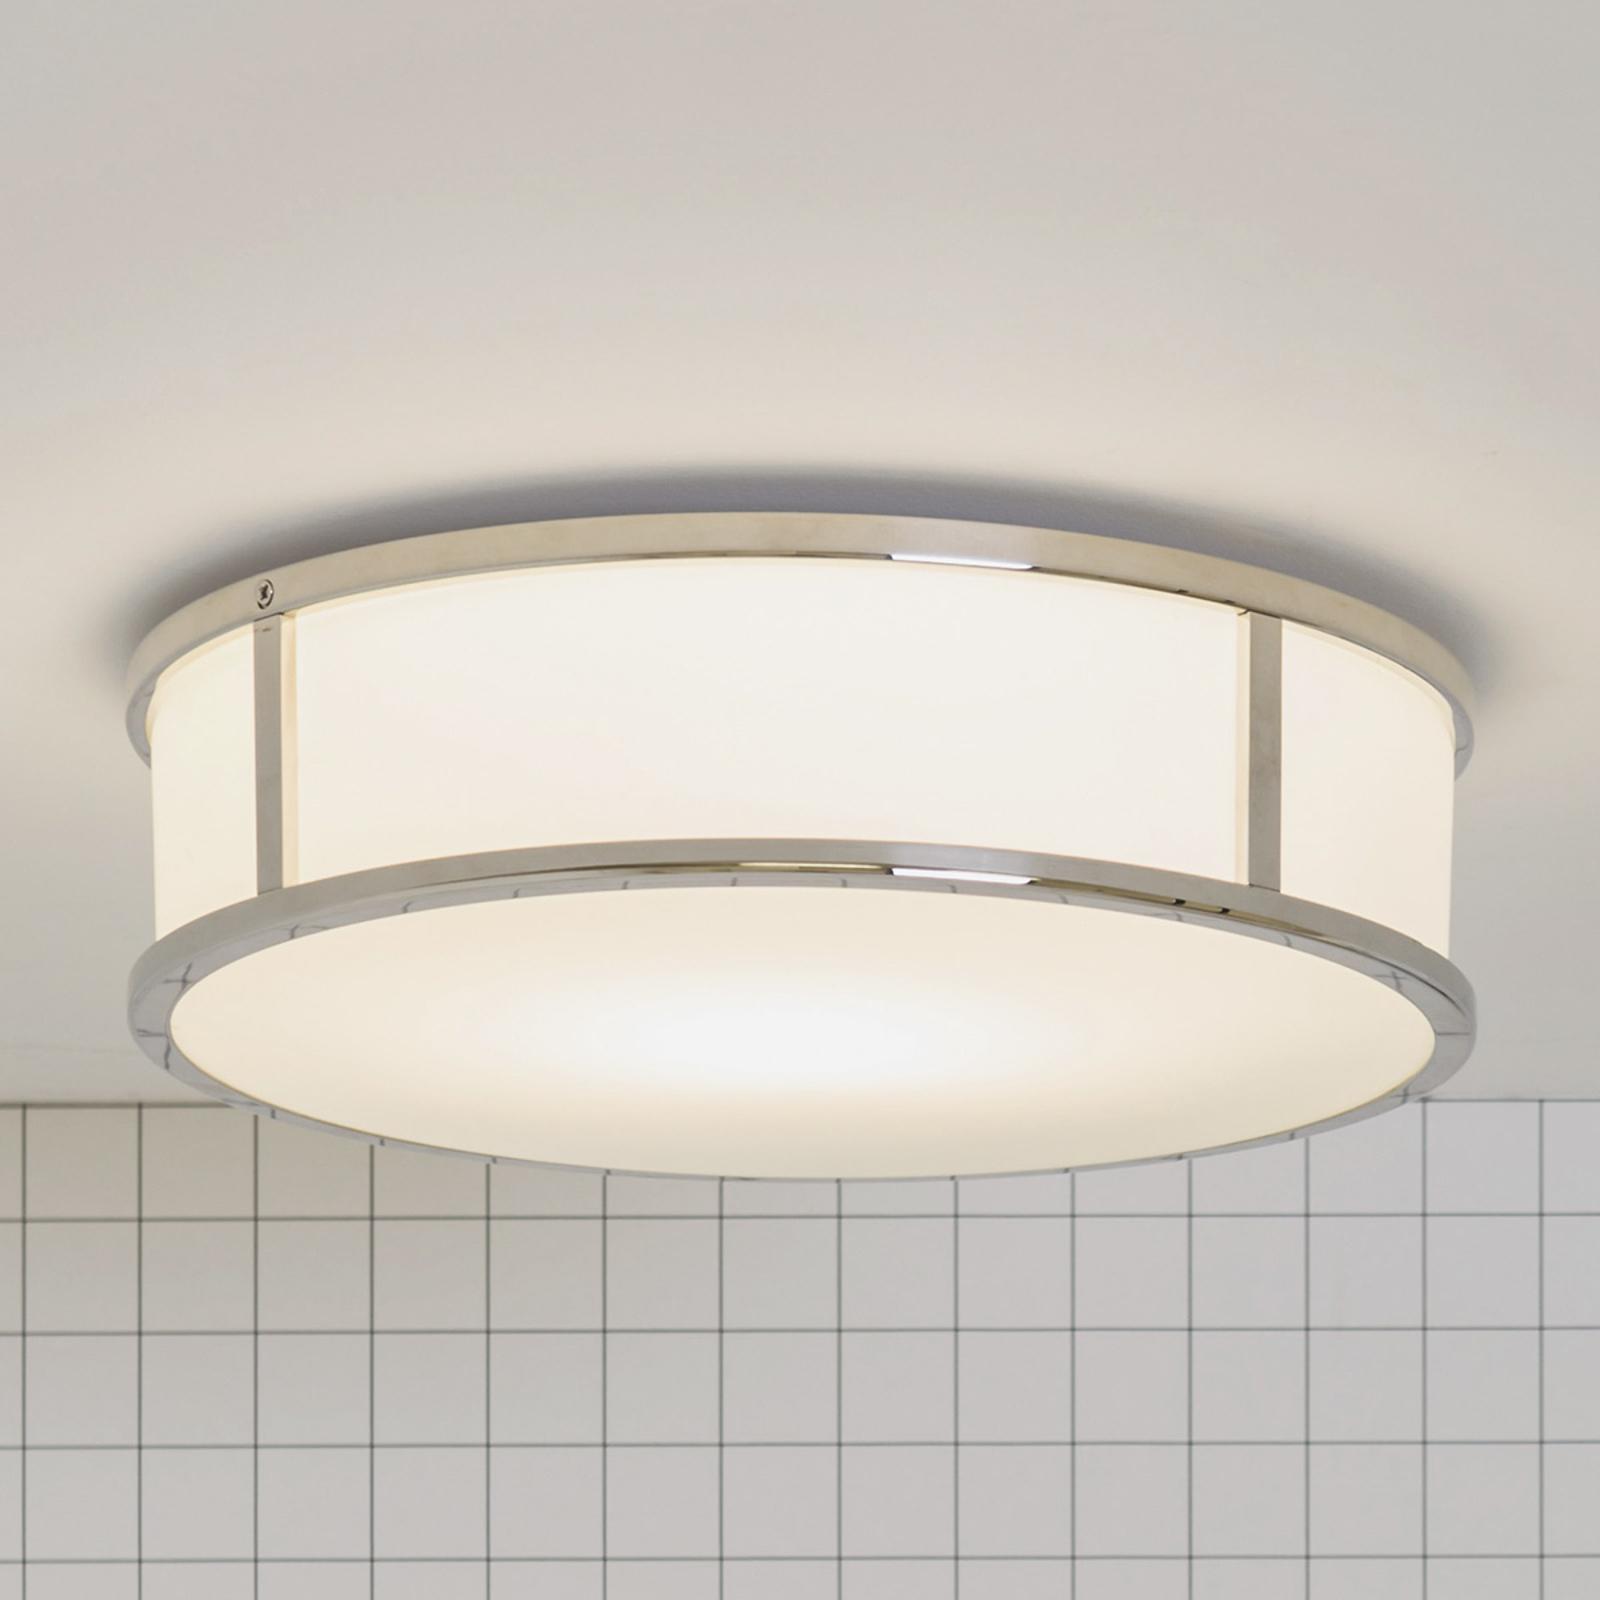 Astro Mashiko Round loftlampe Ø 30 cm krom